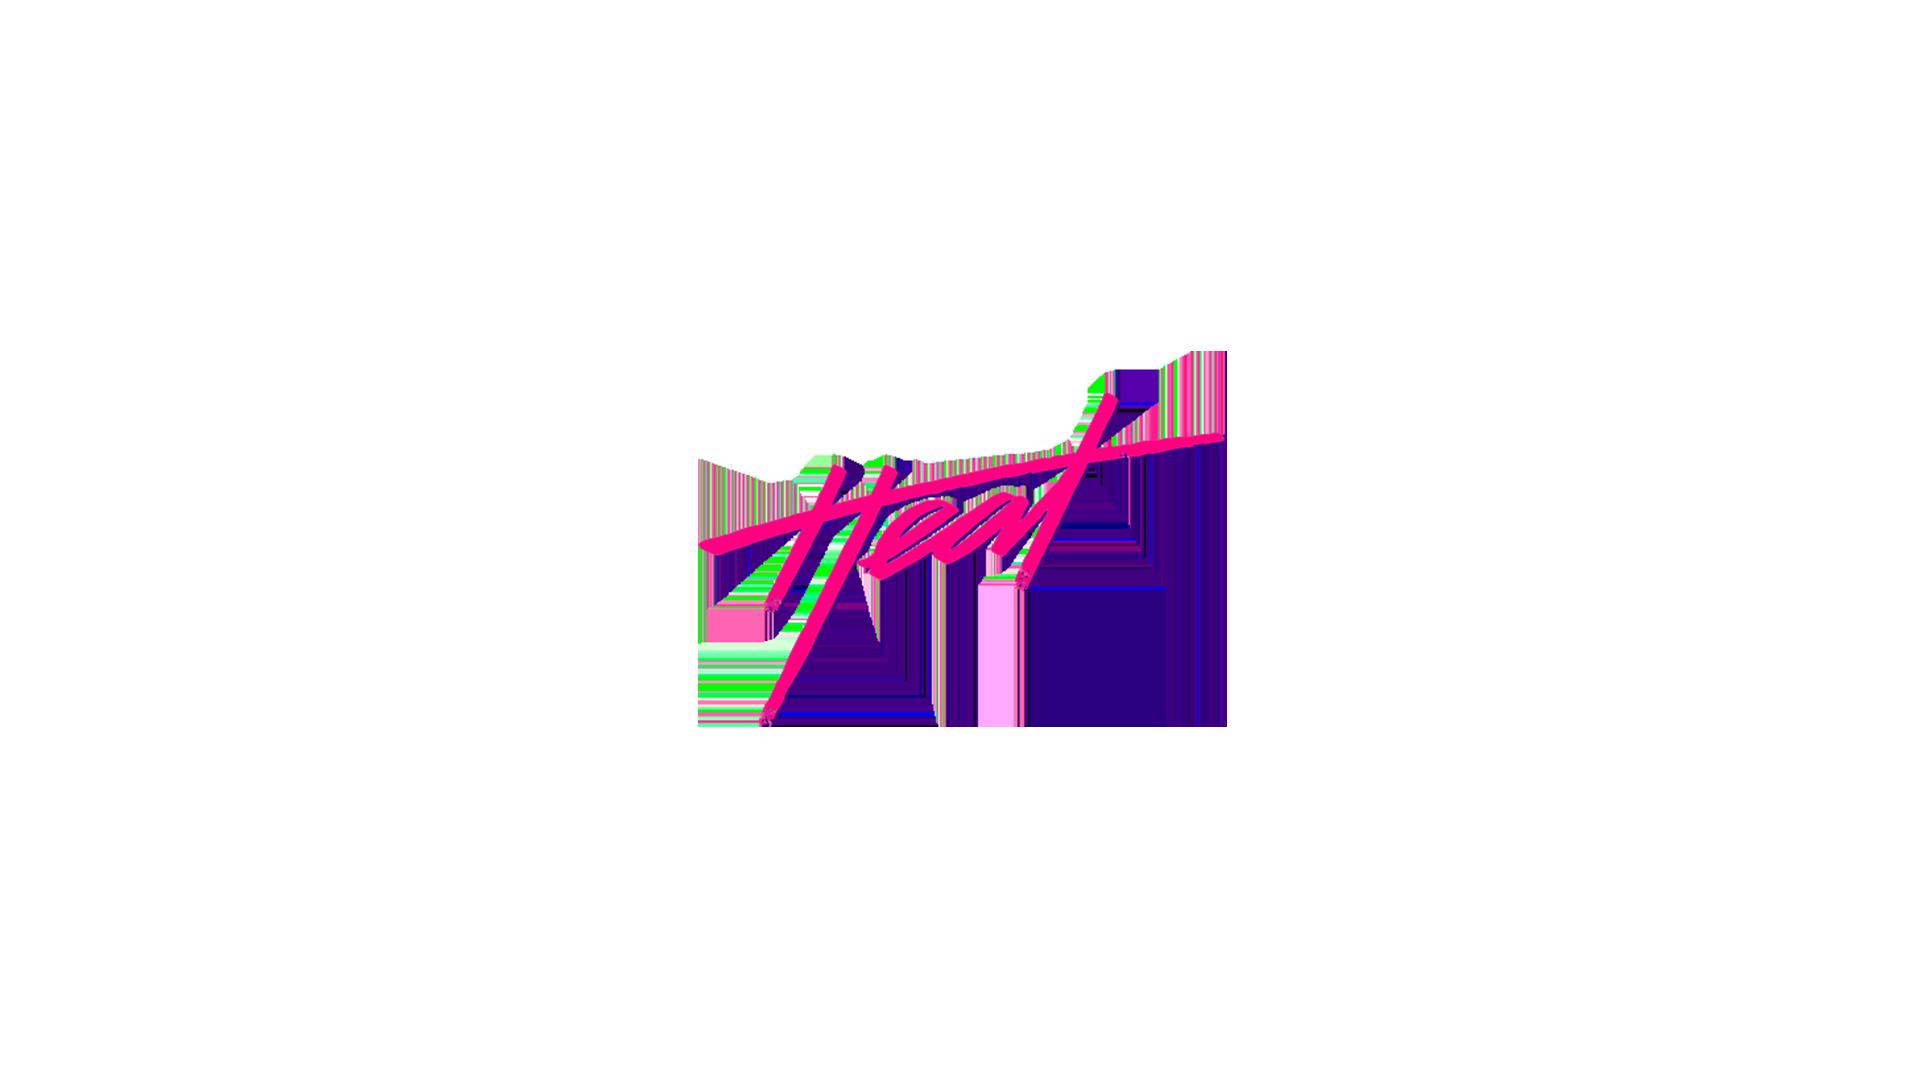 nfs_logo_hero-1